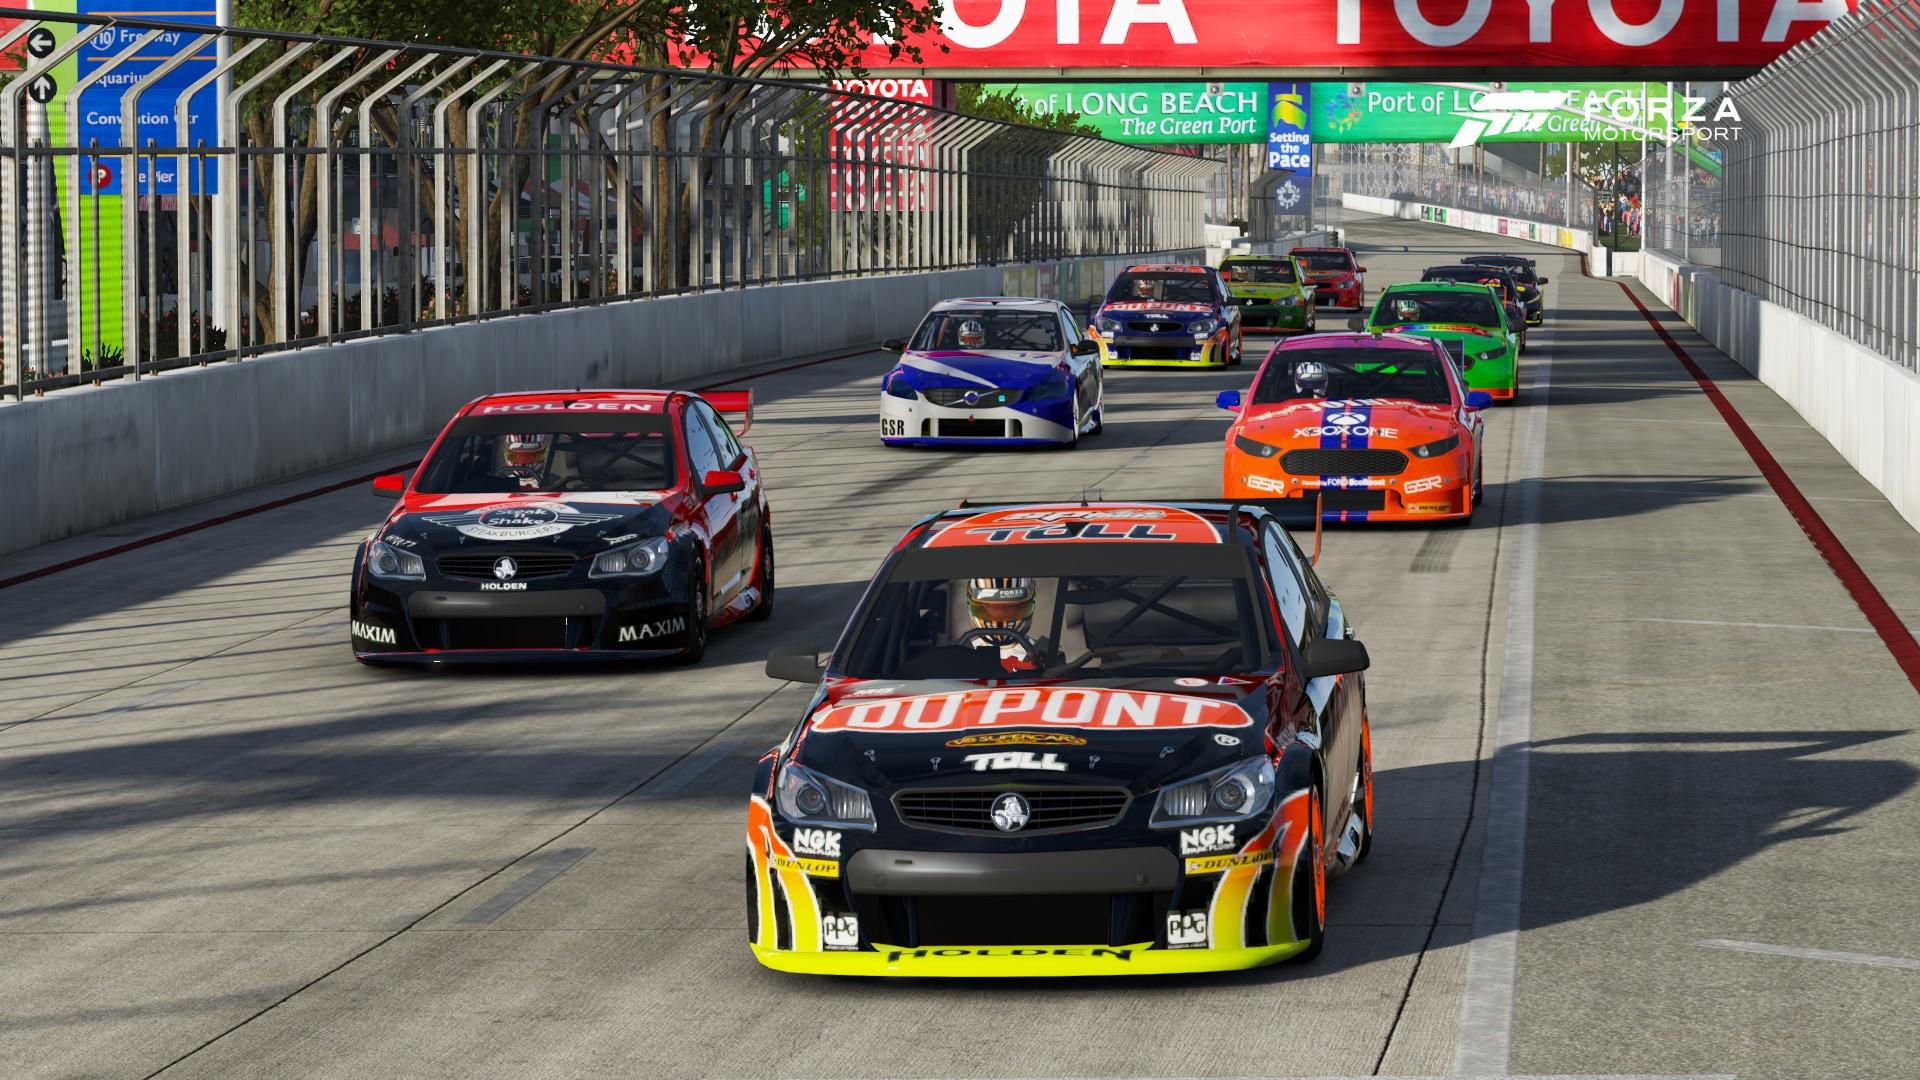 Global Sim Racing - V8 Supercars Championship on youtube basketball, youtube football, youtube trophy,